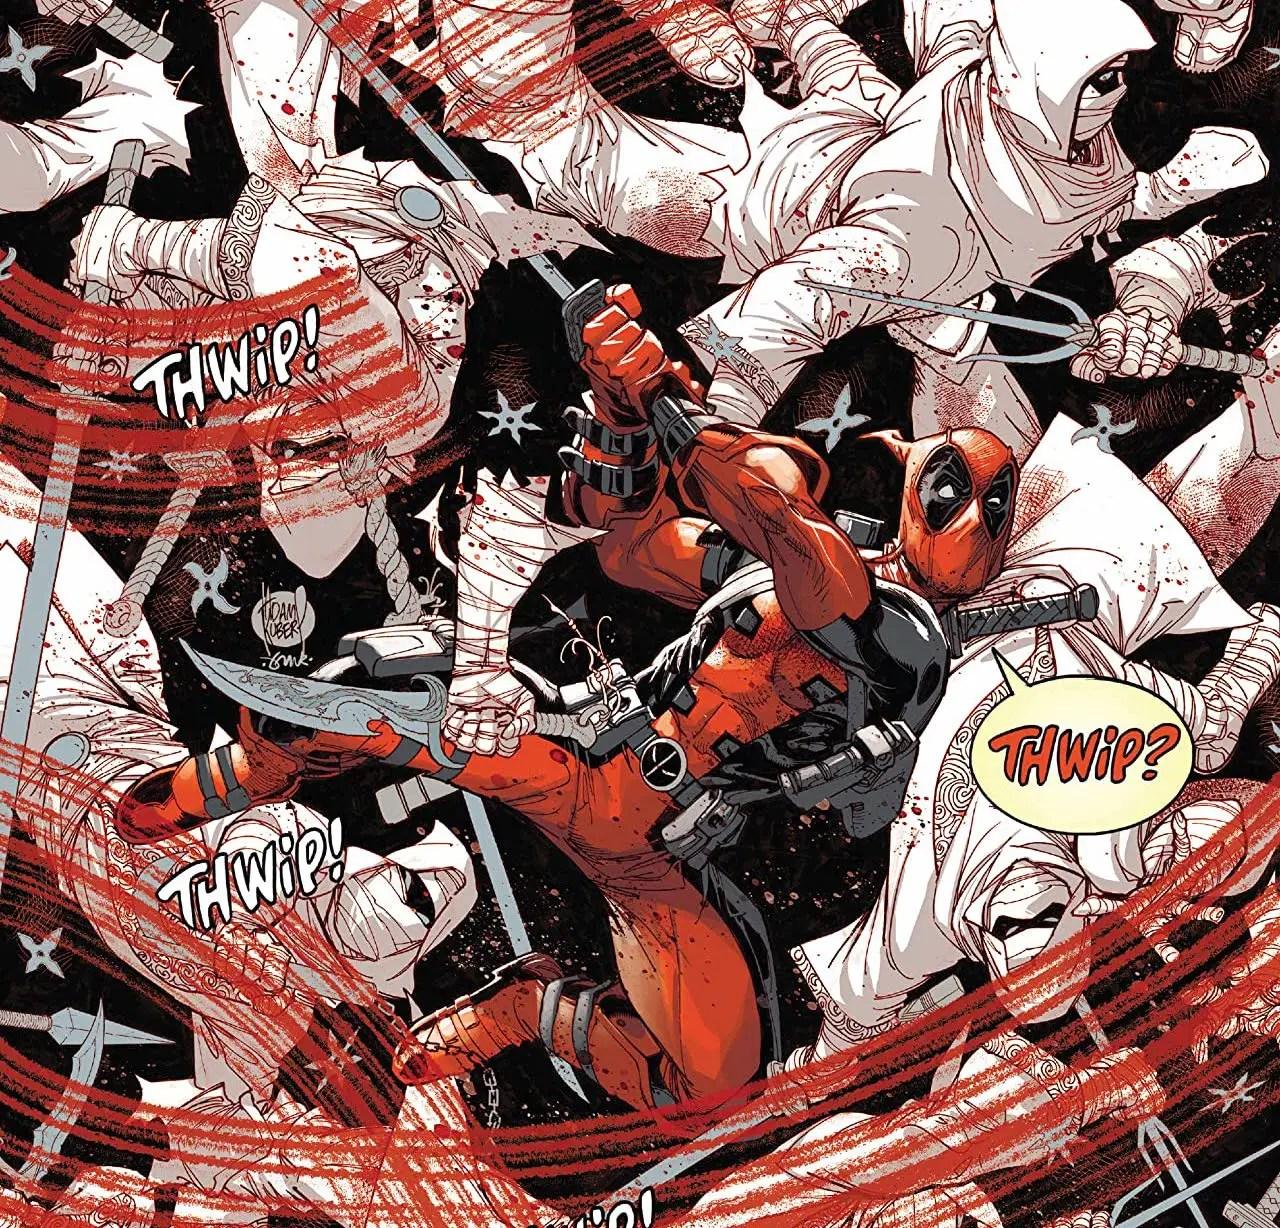 'Deadpool: Black, White & Blood' #1 has plenty of good comedy